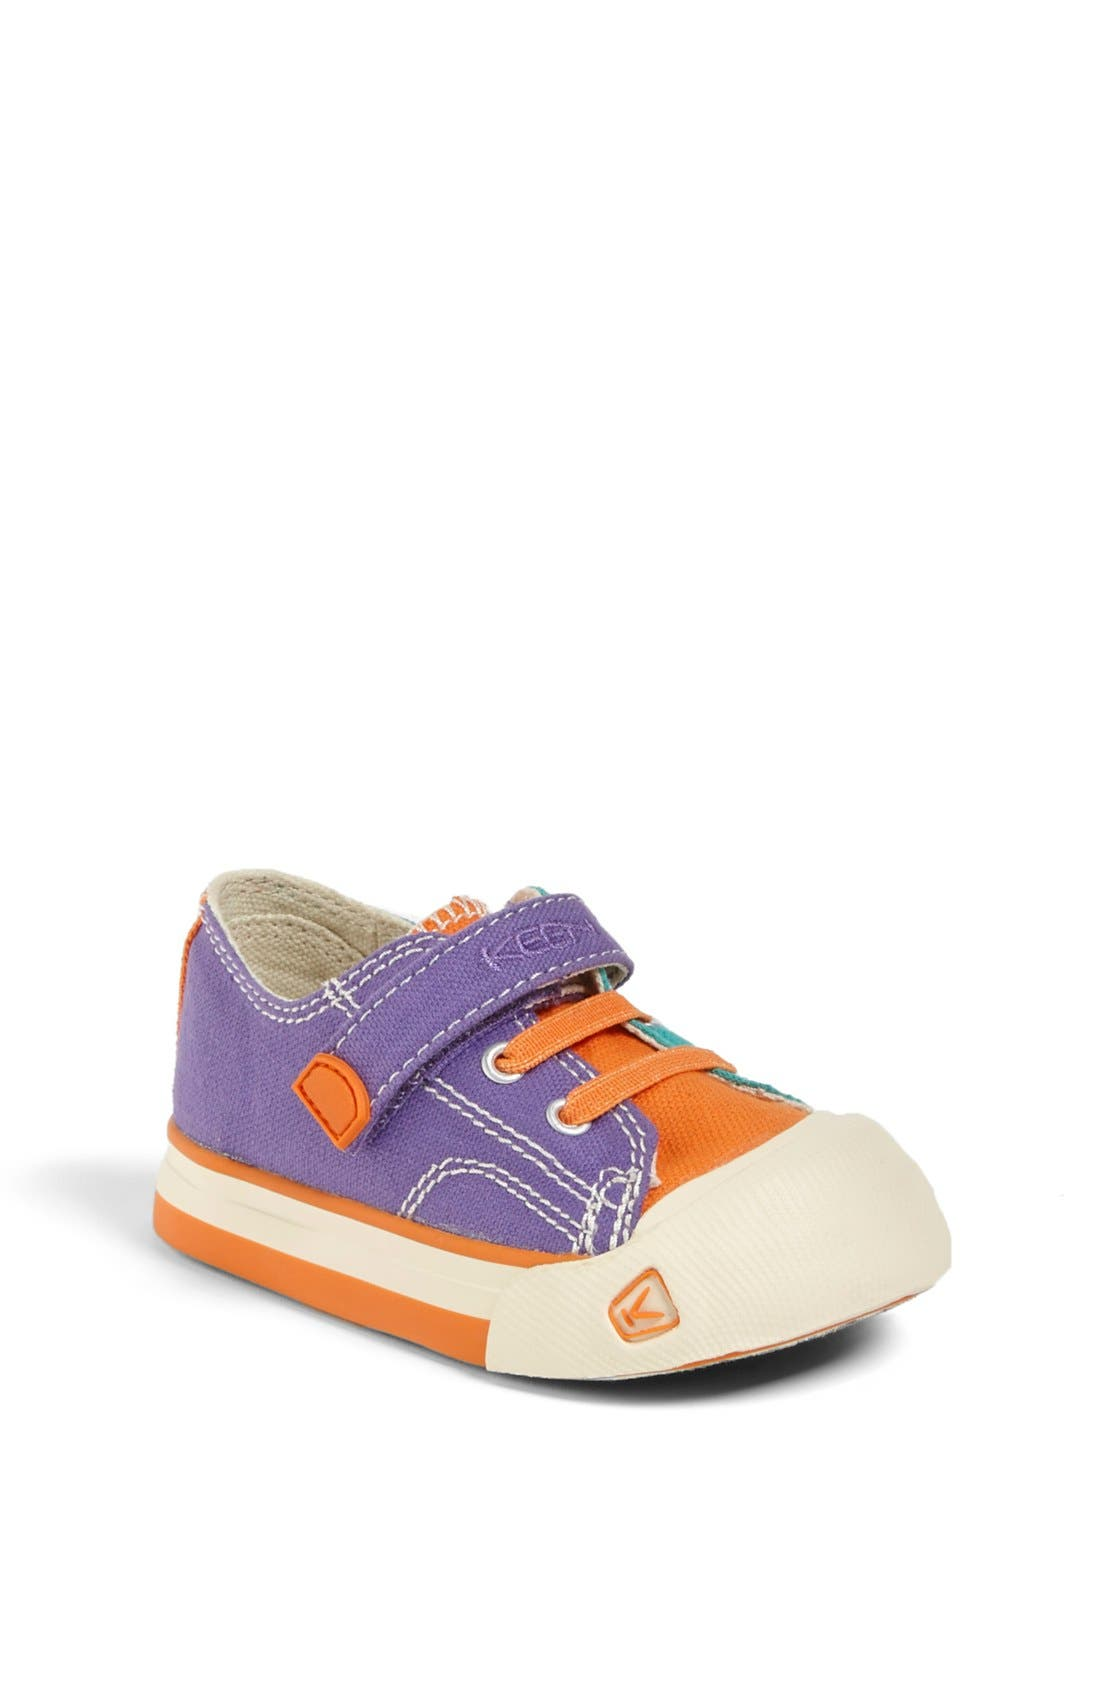 Alternate Image 1 Selected - Keen 'Coronado' Sneaker (Baby & Walker)